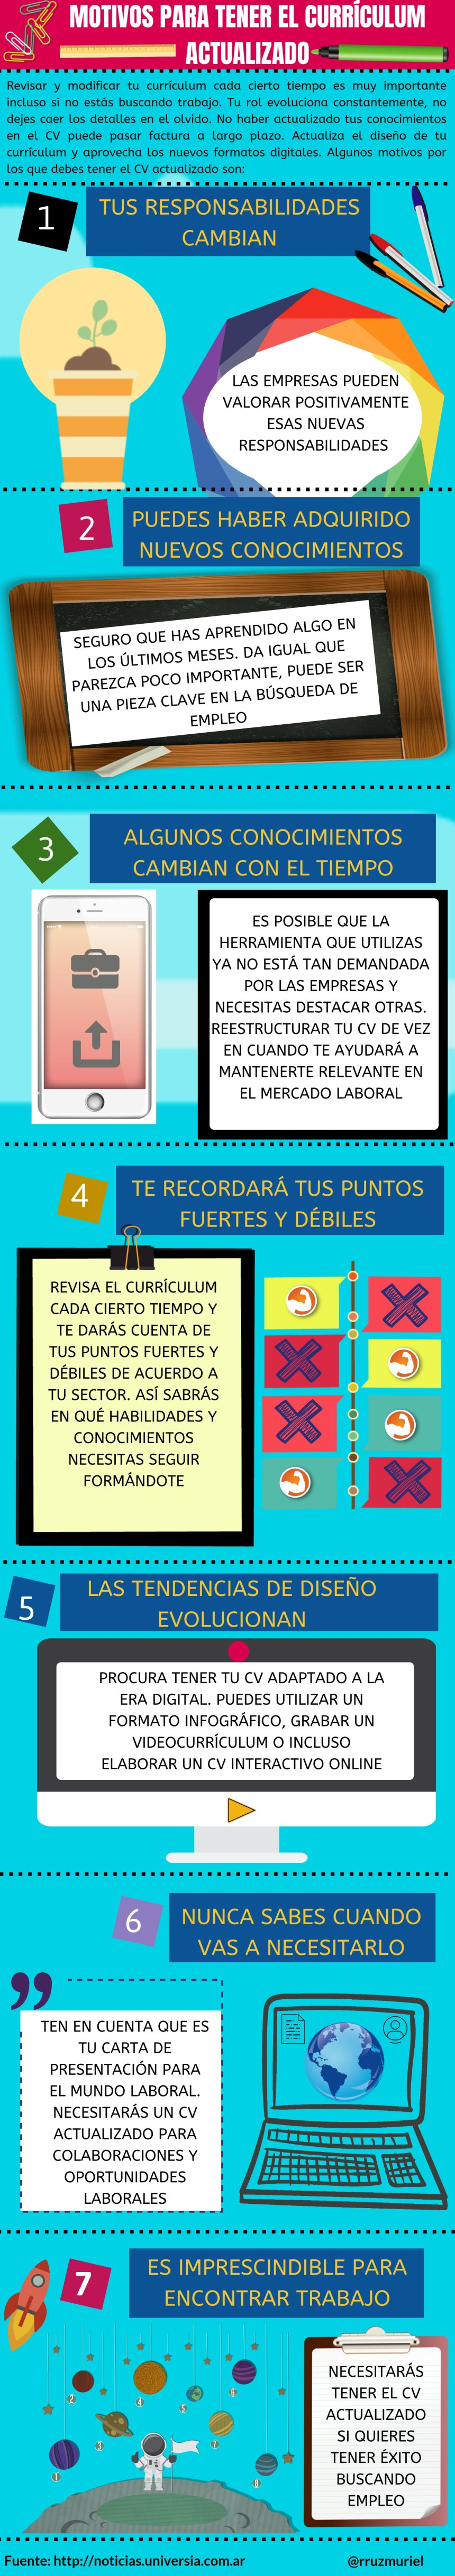 Motivos para tener el Currículum actualizdo #infografia #infographic #empleo